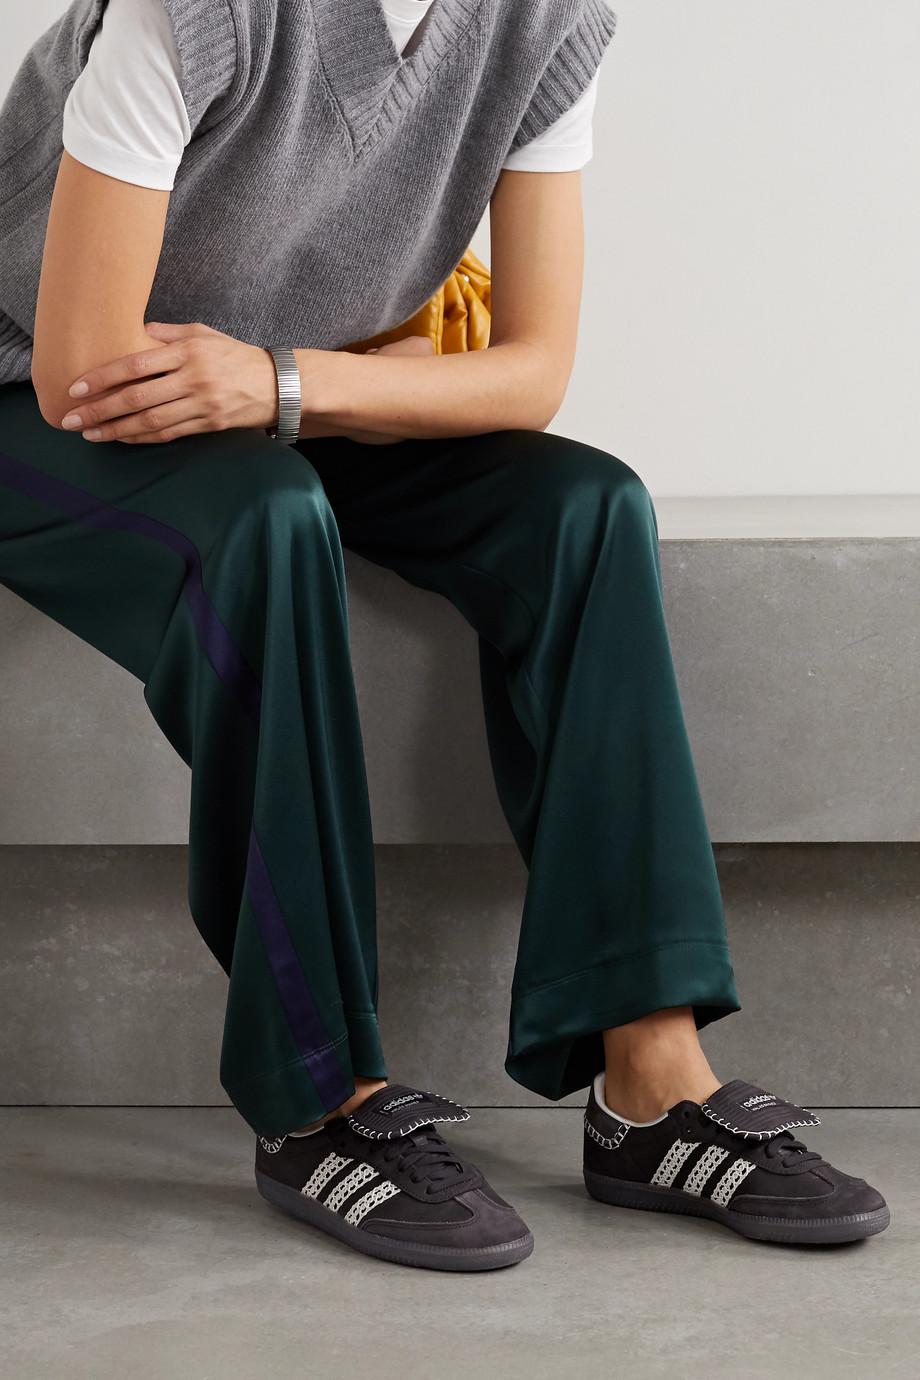 adidas Originals Baskets en cuir et en daim à finitions en crochet Samba x Wales Bonner